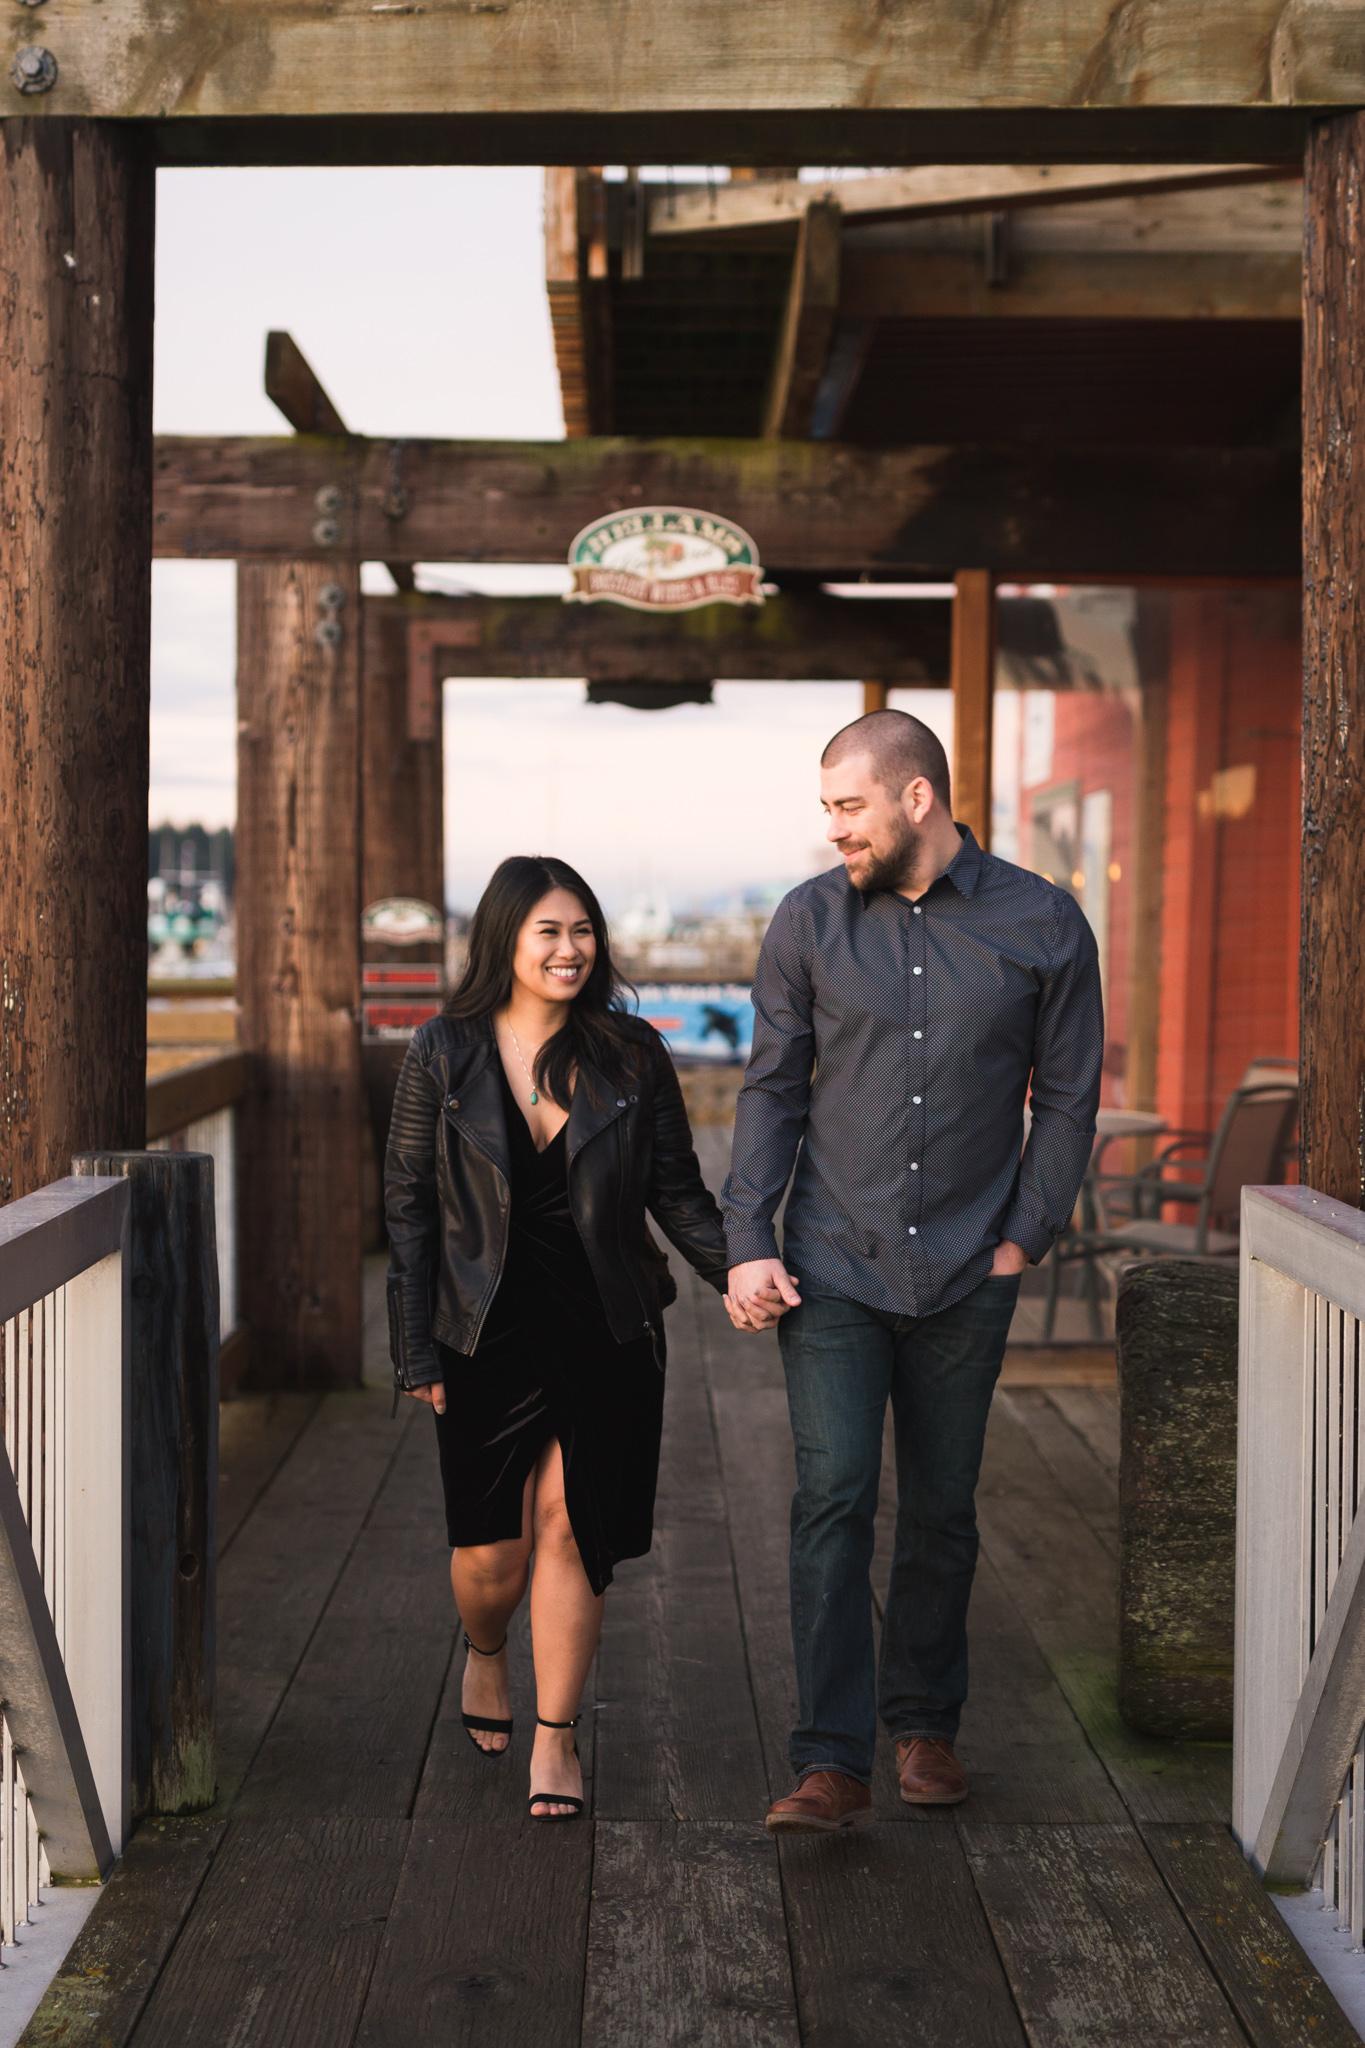 LucyTony-2018-Rosario-Engagement-61.jpg